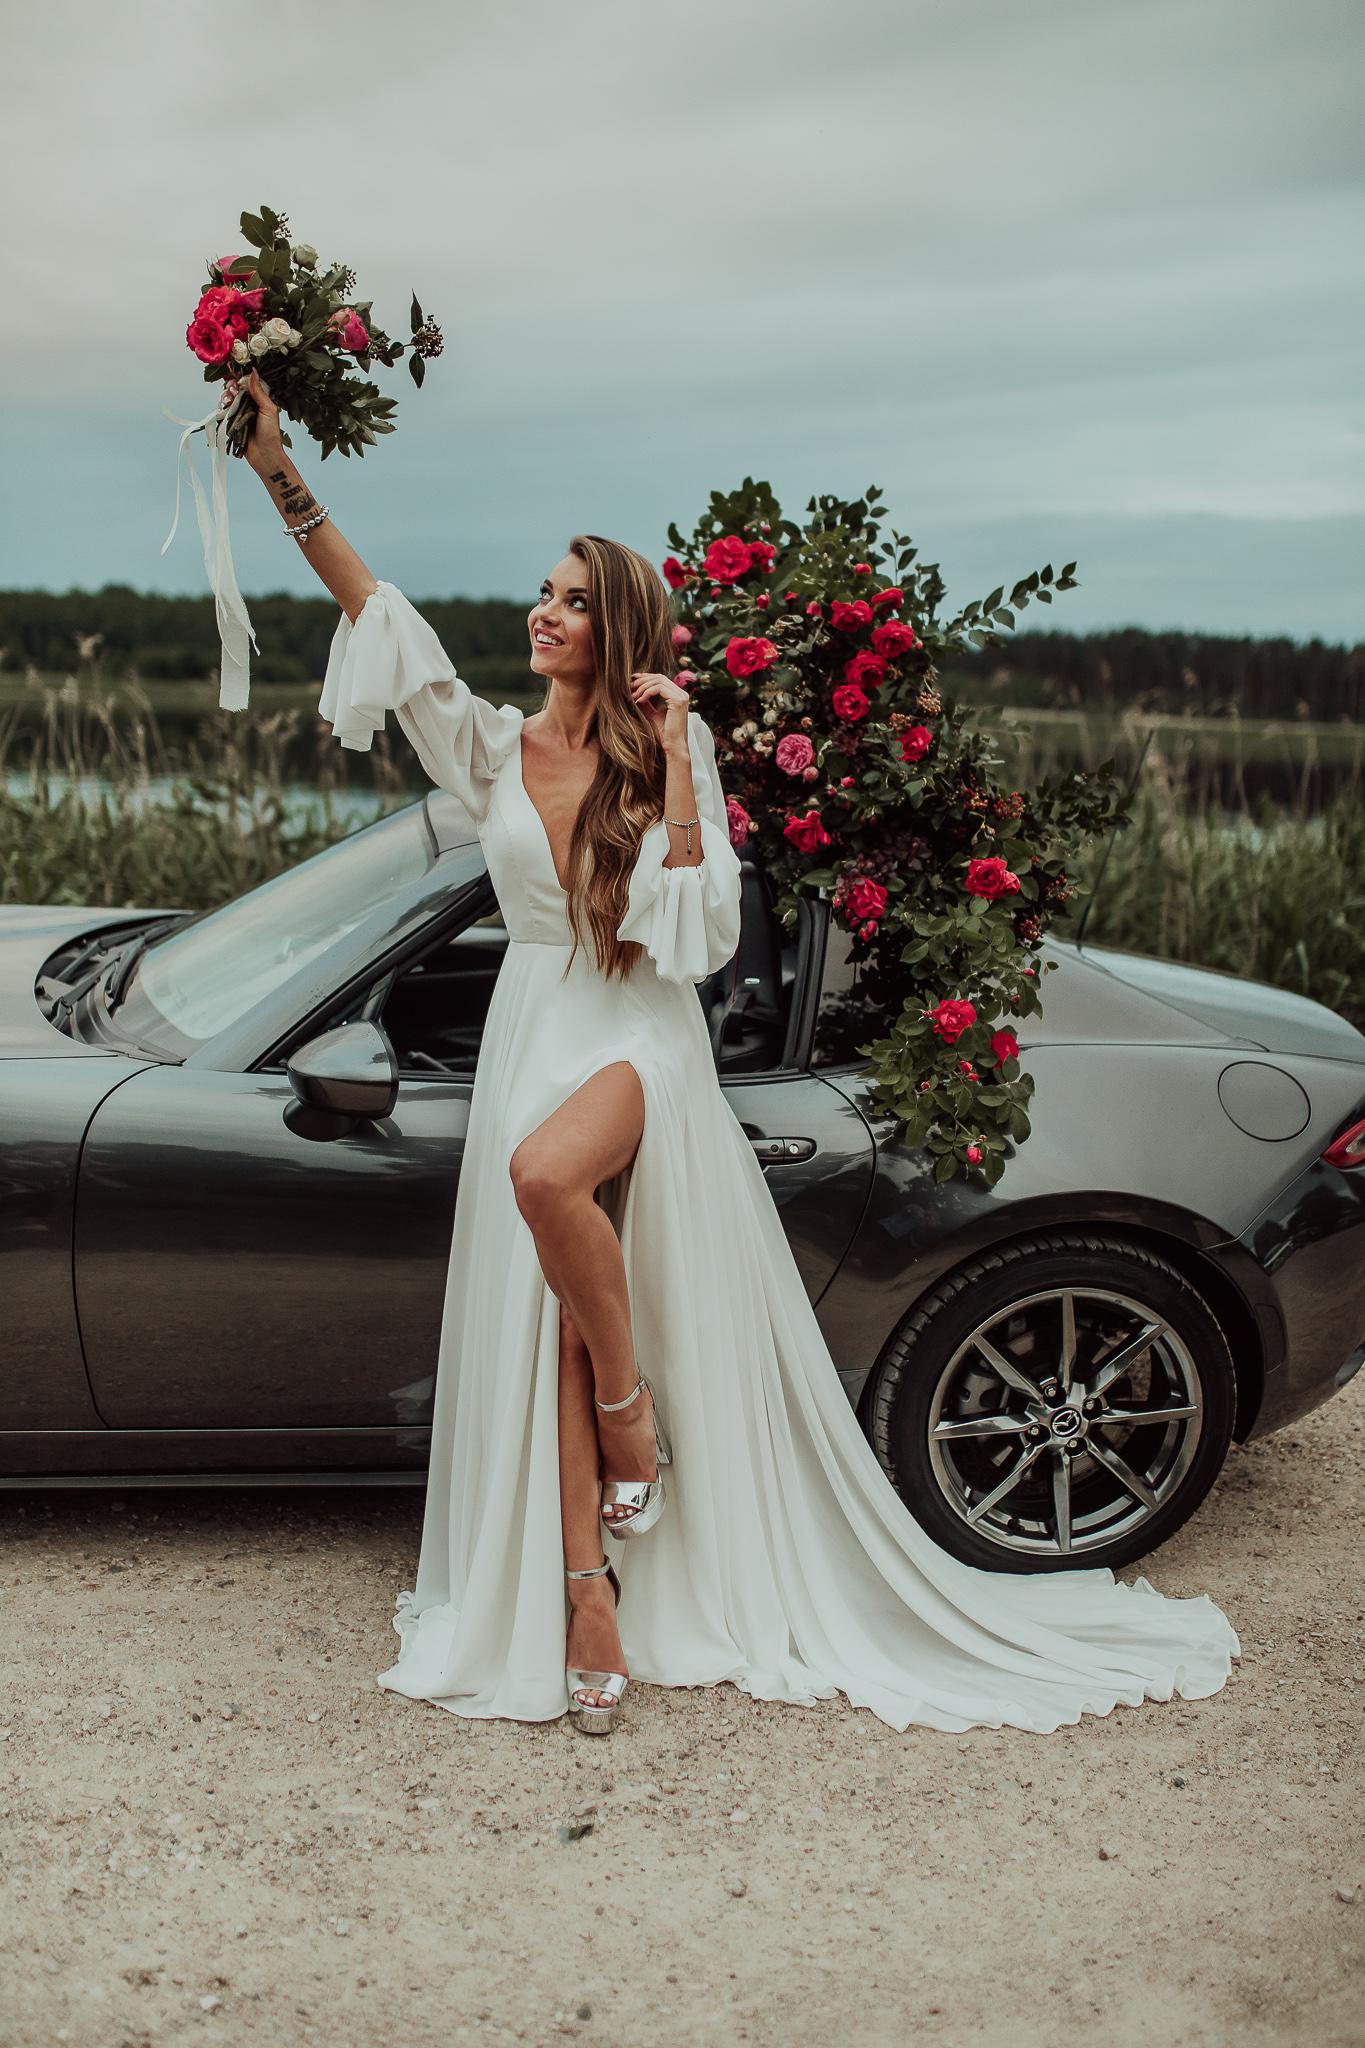 Amelia-wedding-dresses-291